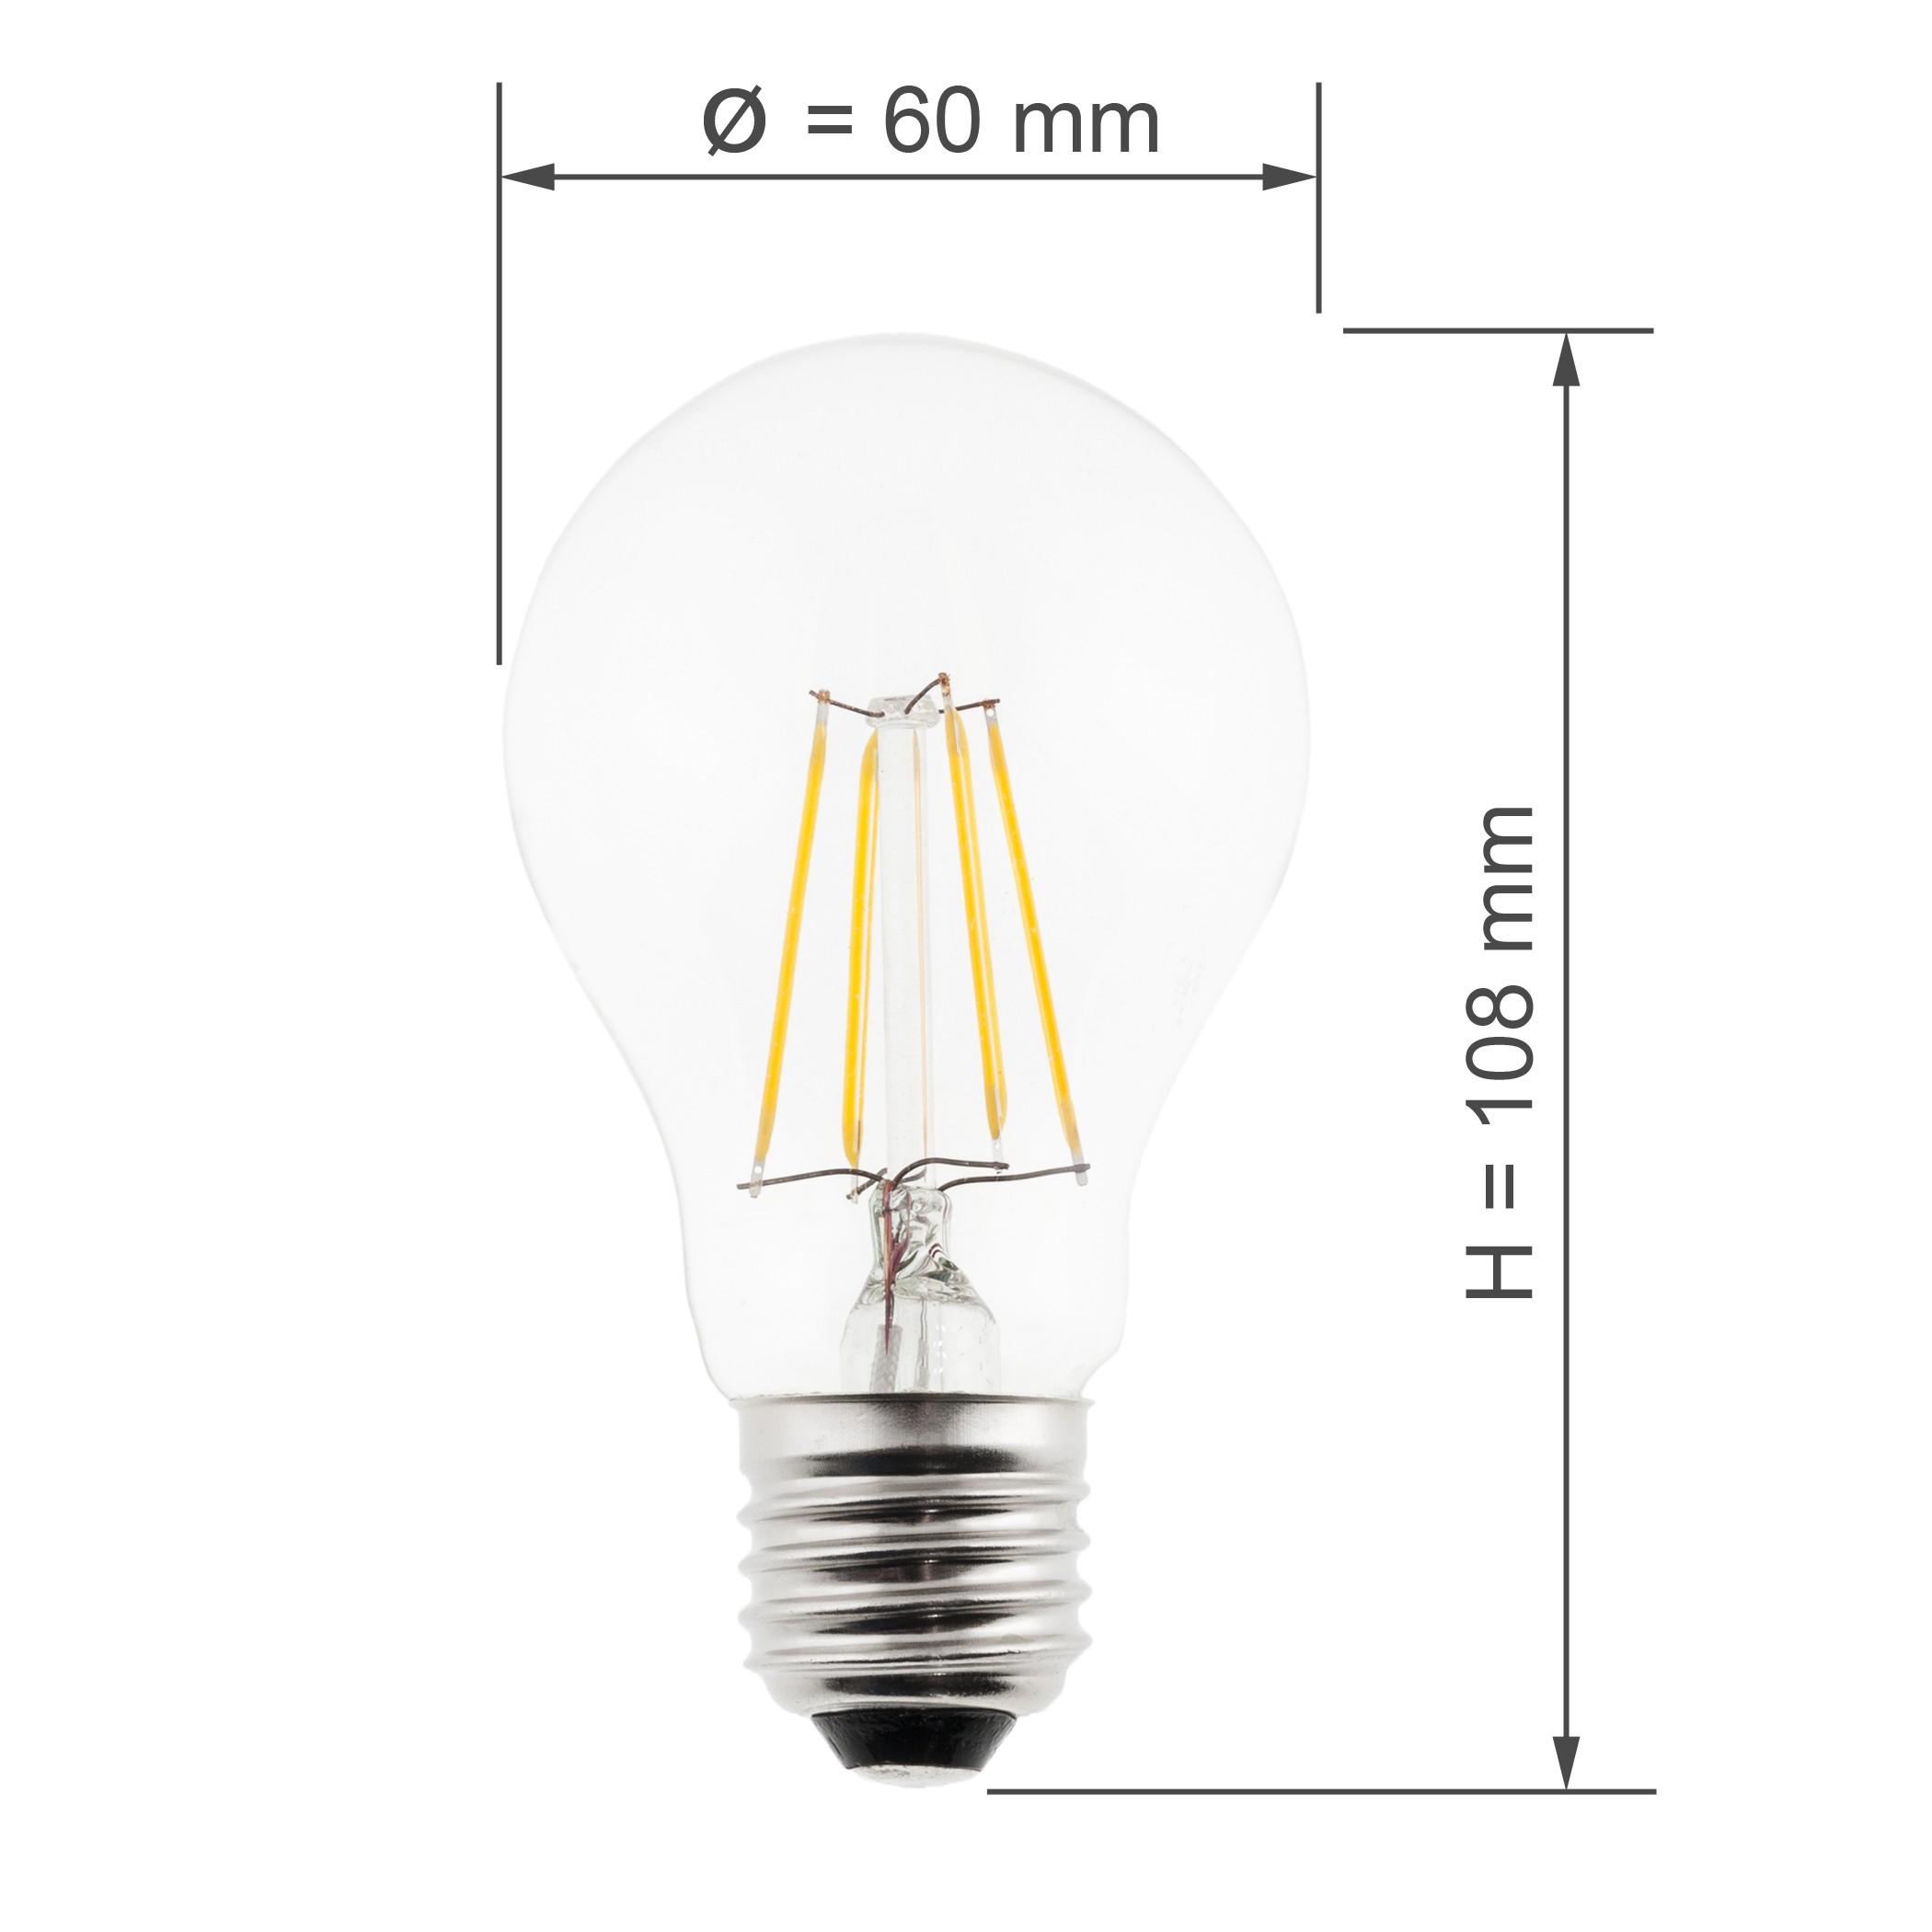 led lampen e27 warmweiss e27 led filament e27 led 4w sebson leuchtmittel ebay. Black Bedroom Furniture Sets. Home Design Ideas